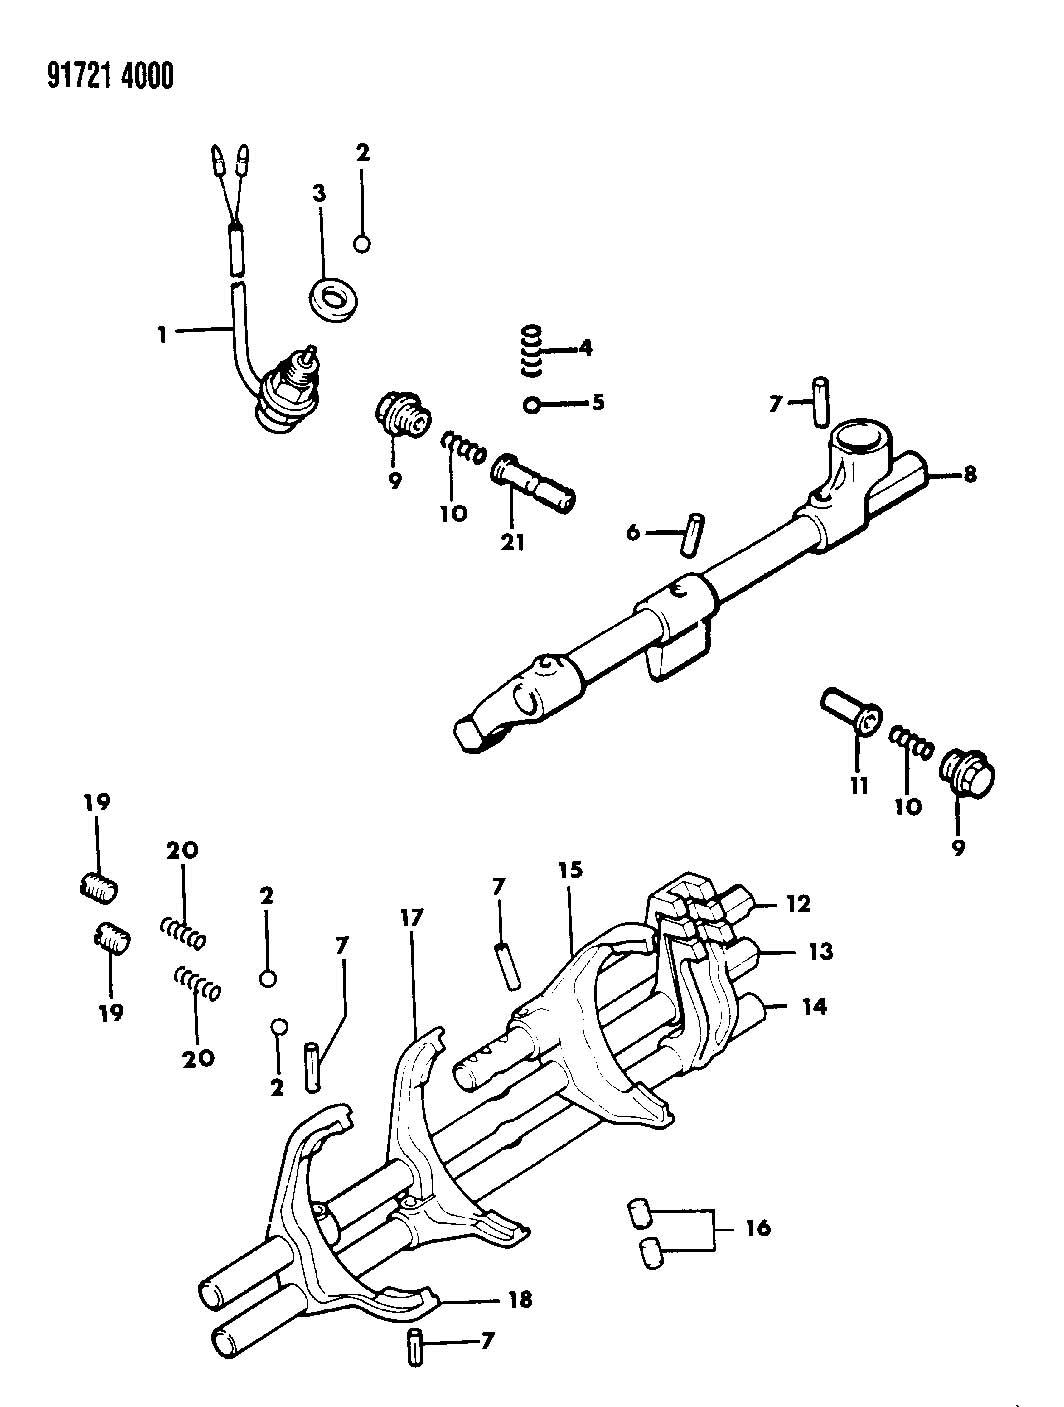 CONTROL, SHIFT MANUAL TRANSMISSION, 5-SPEED 27 RWD, T ENGINE